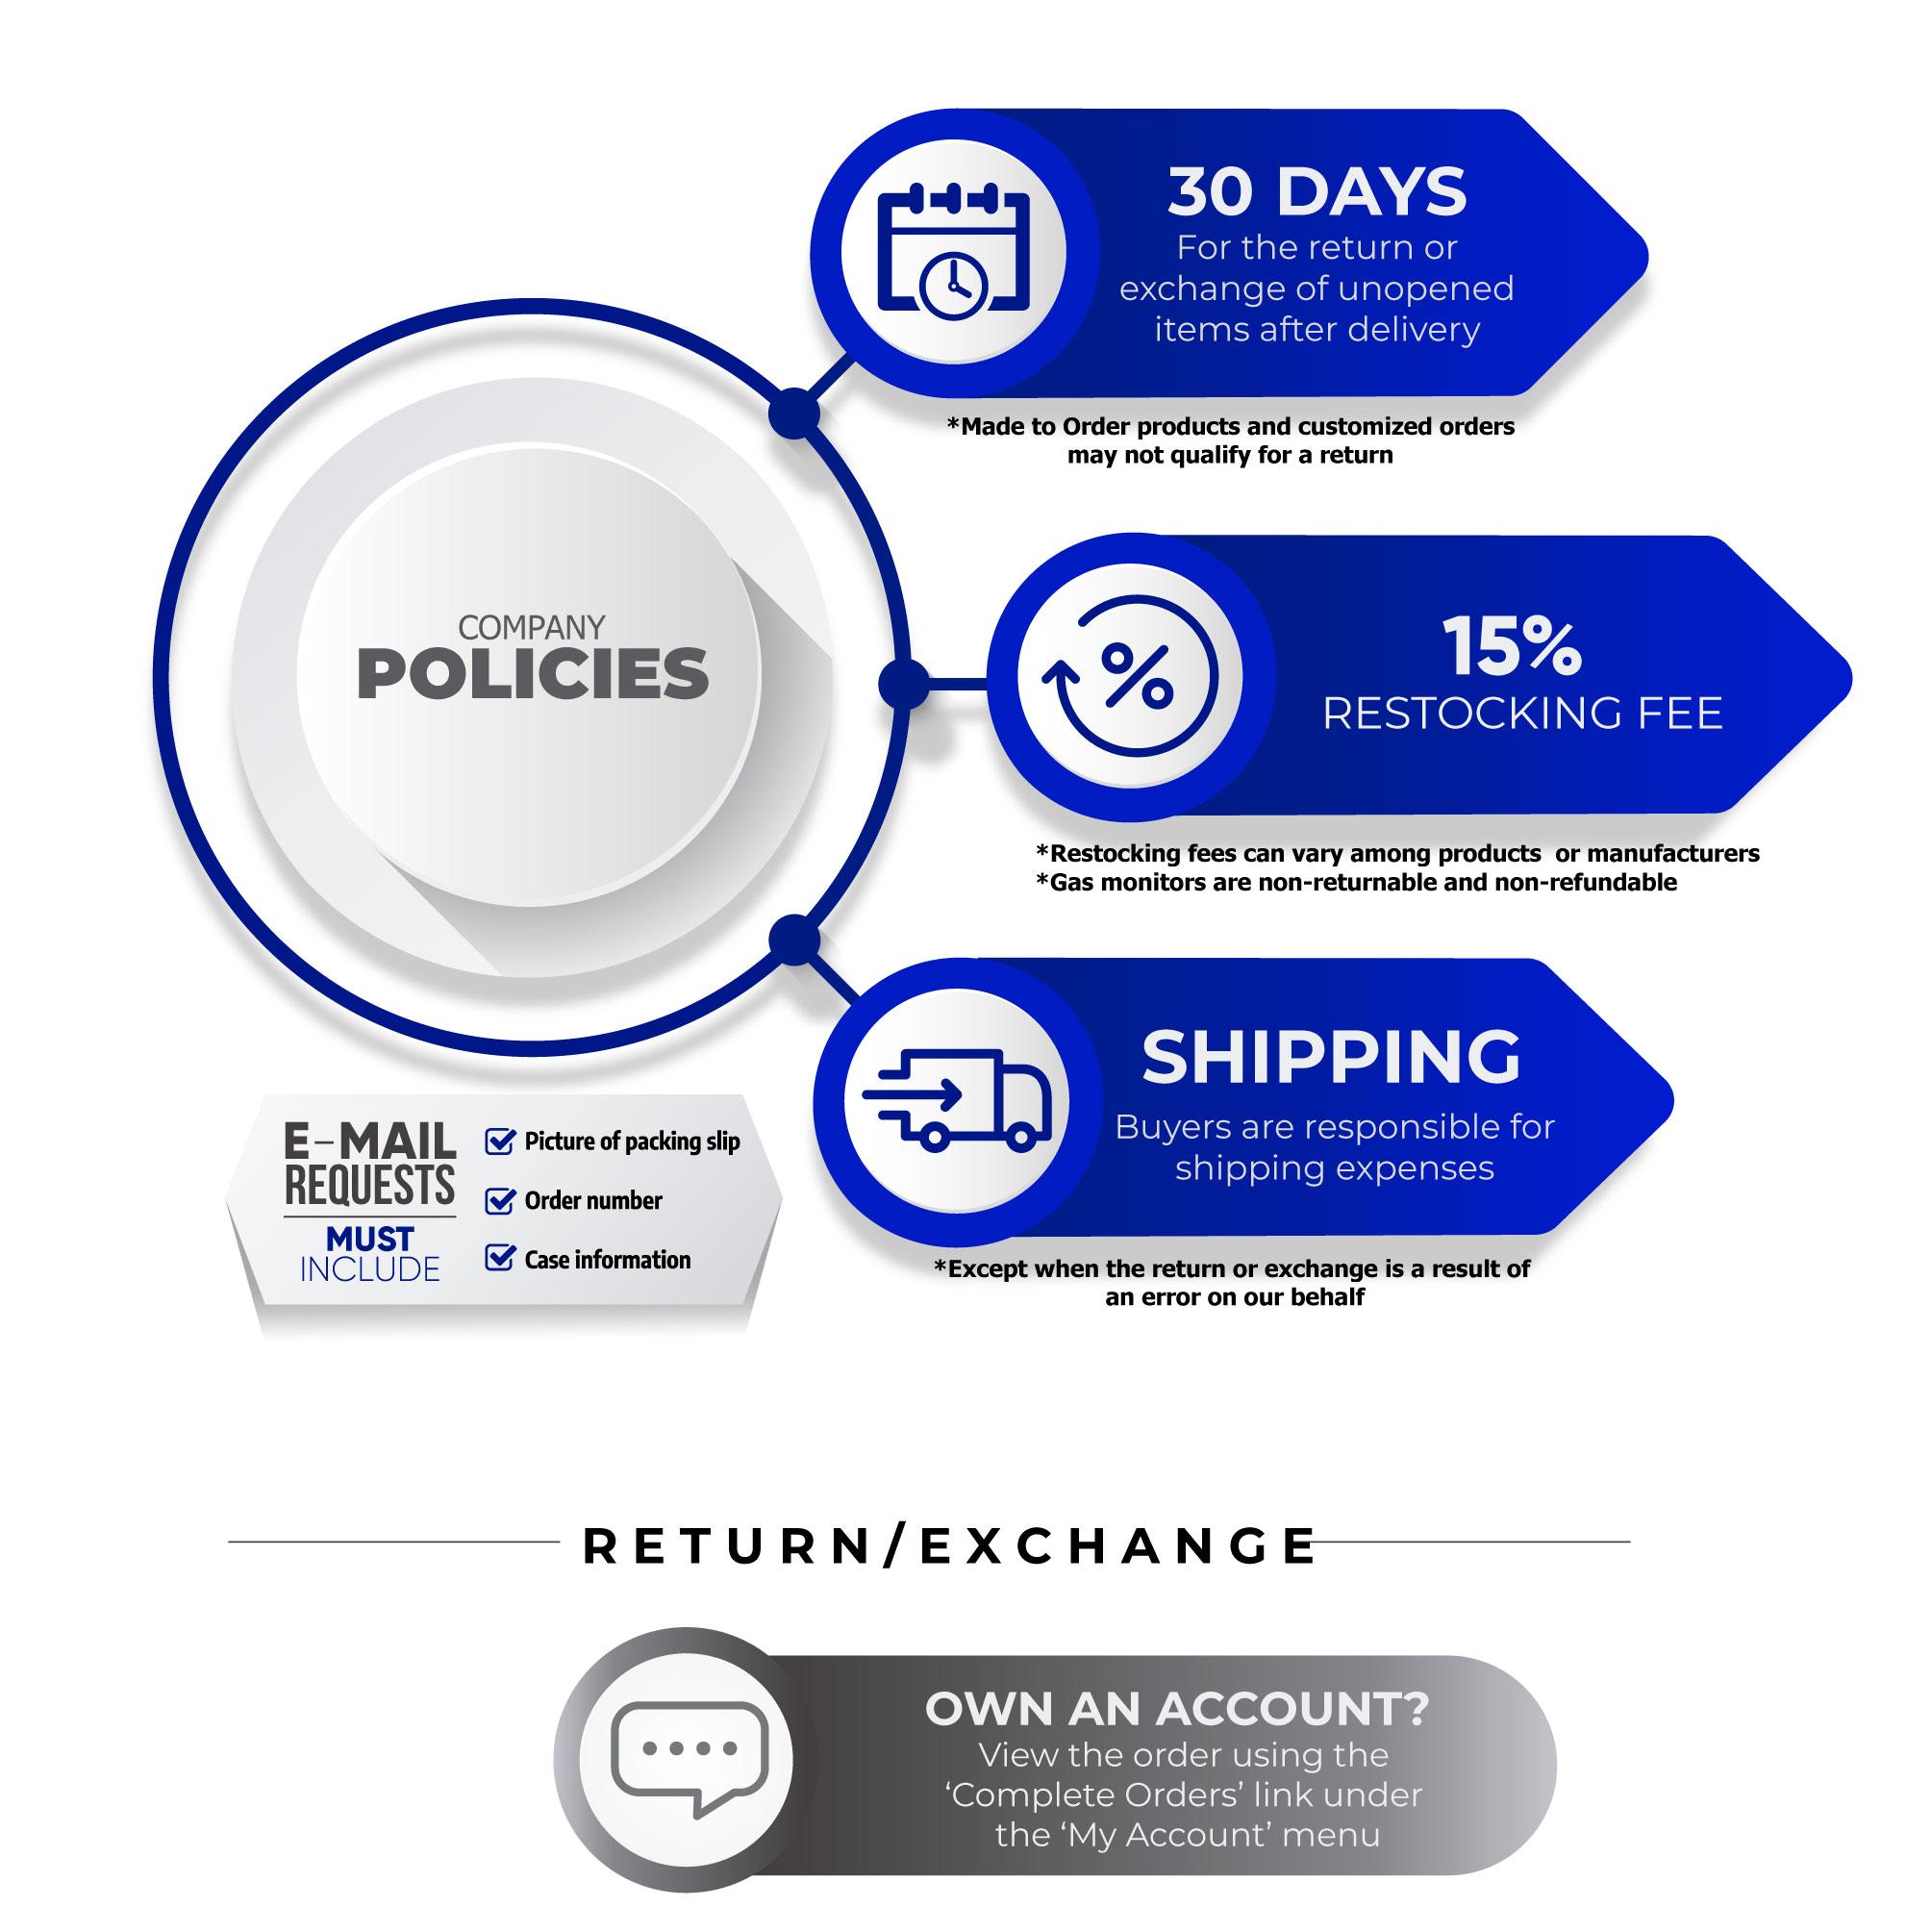 returns-exchange-cancellations-both-stores2.jpg